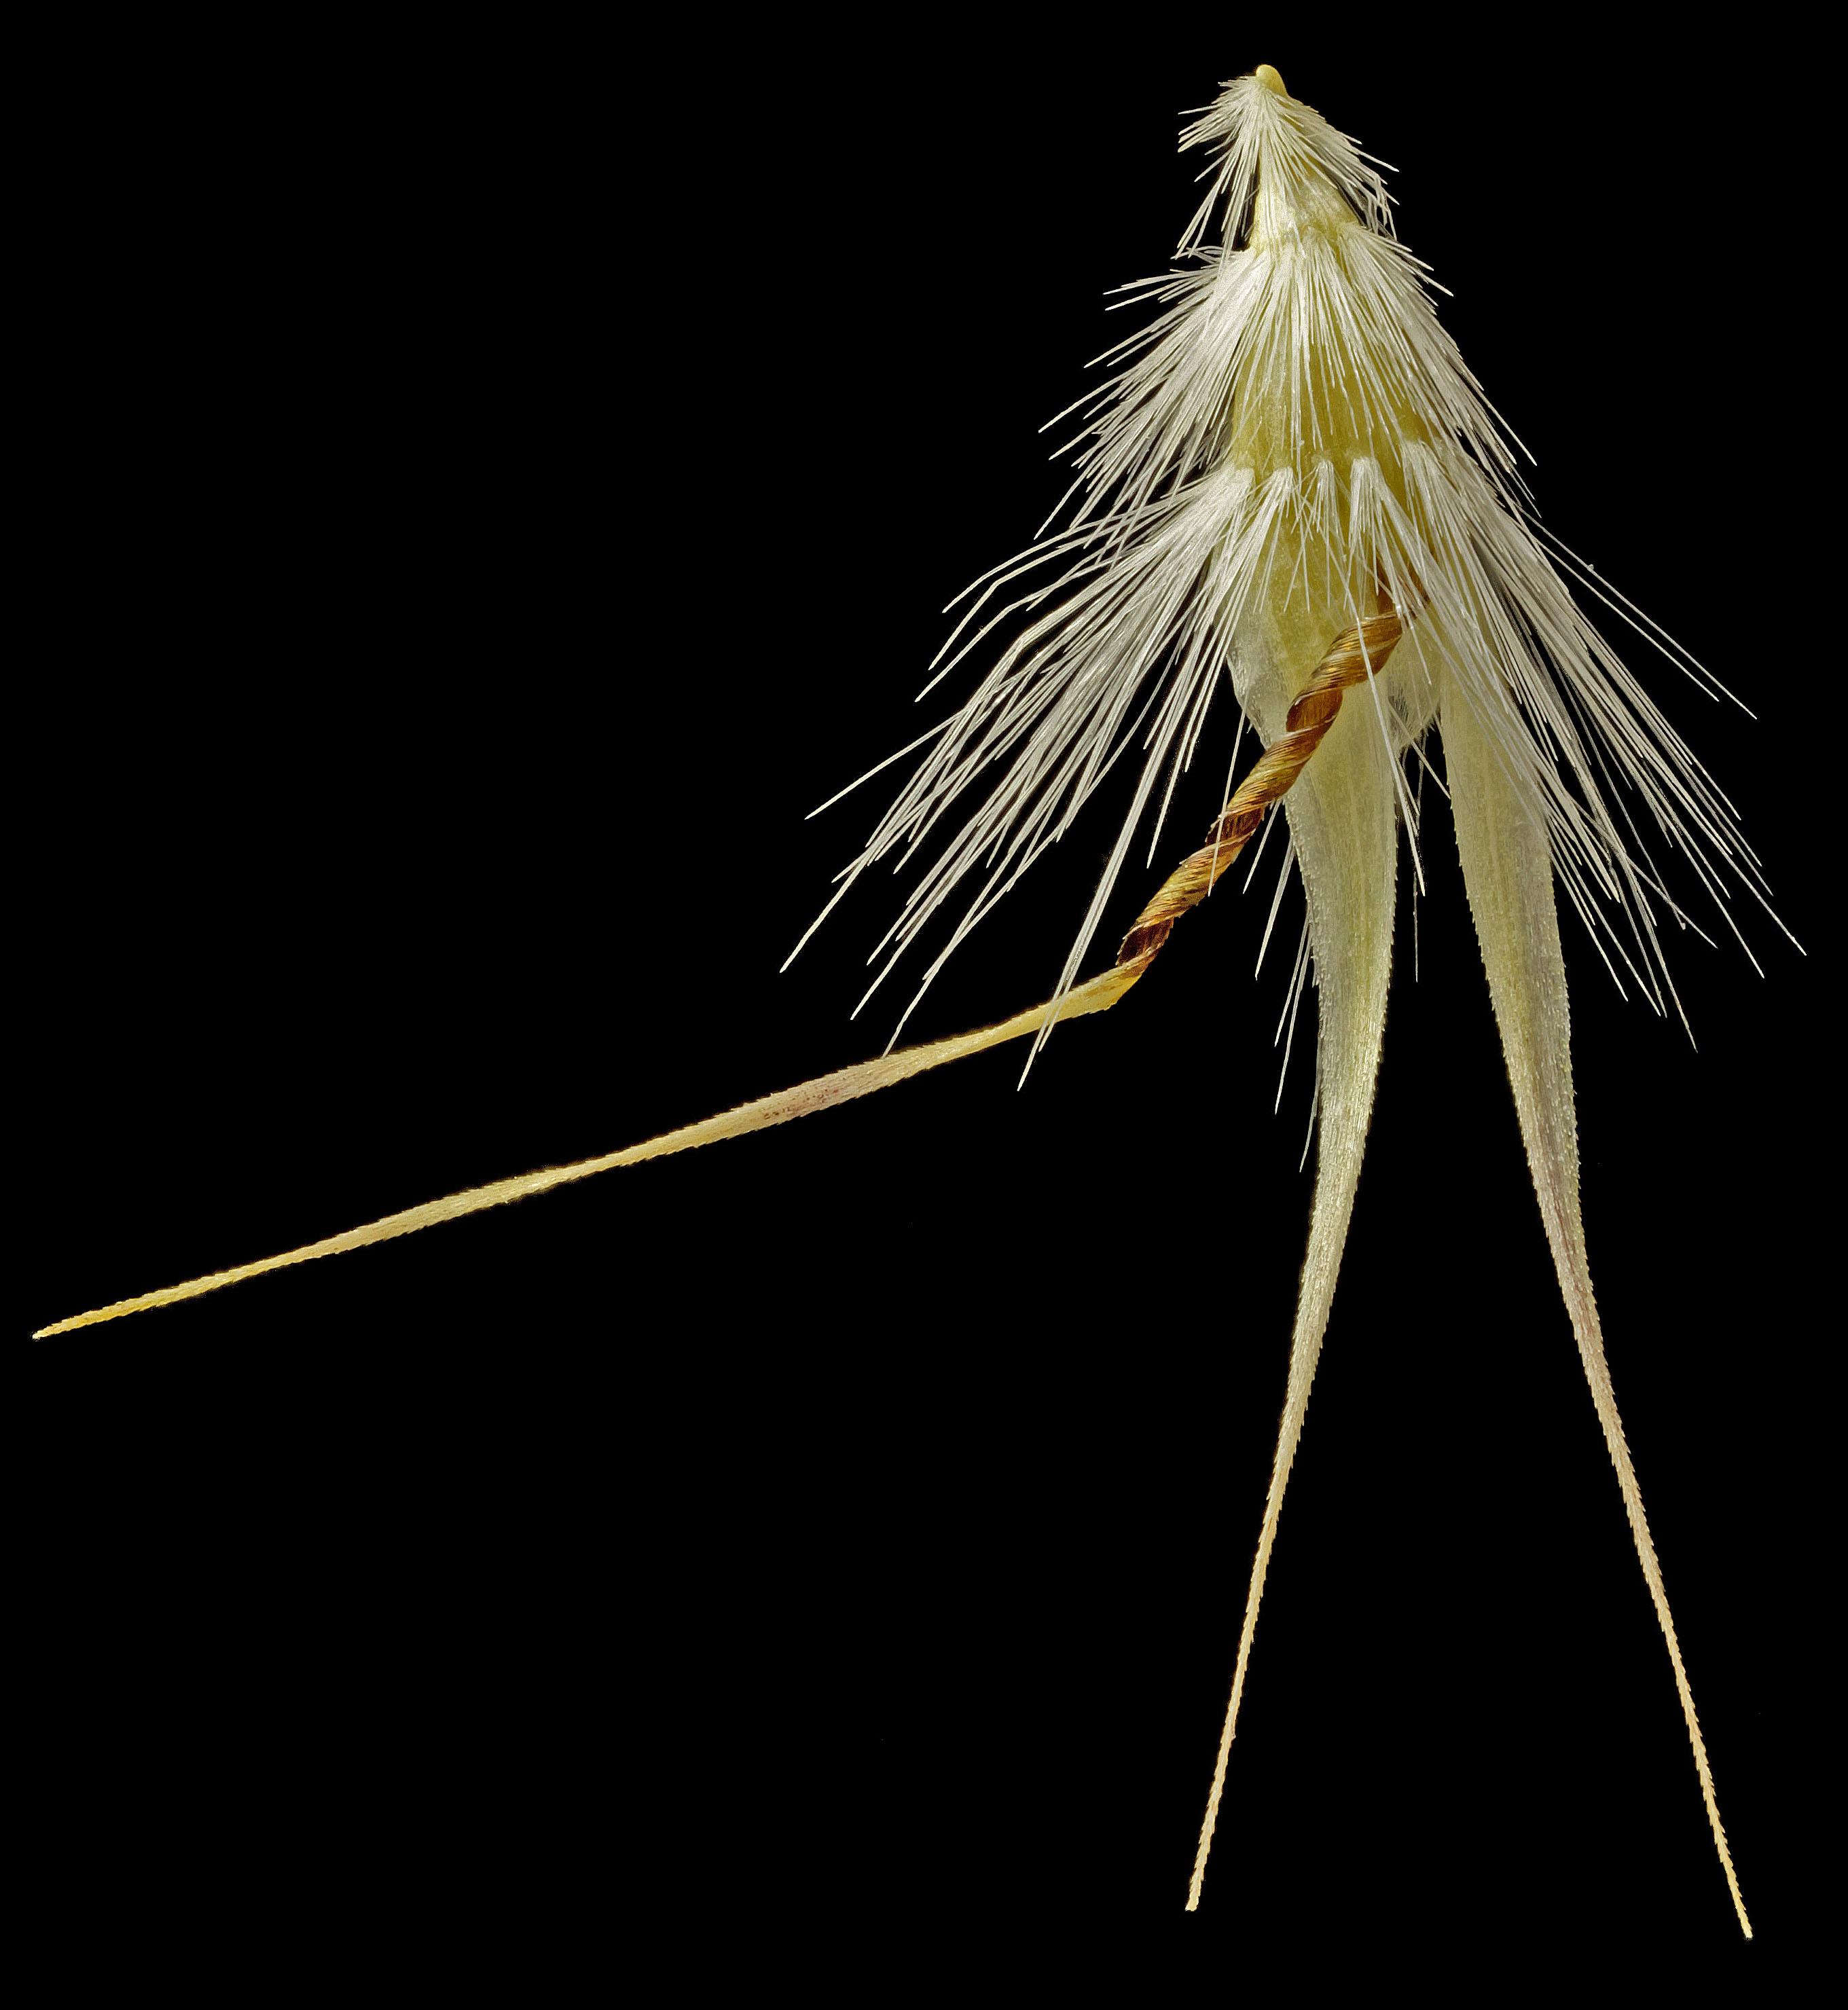 R.monicola-1050pix.jpg